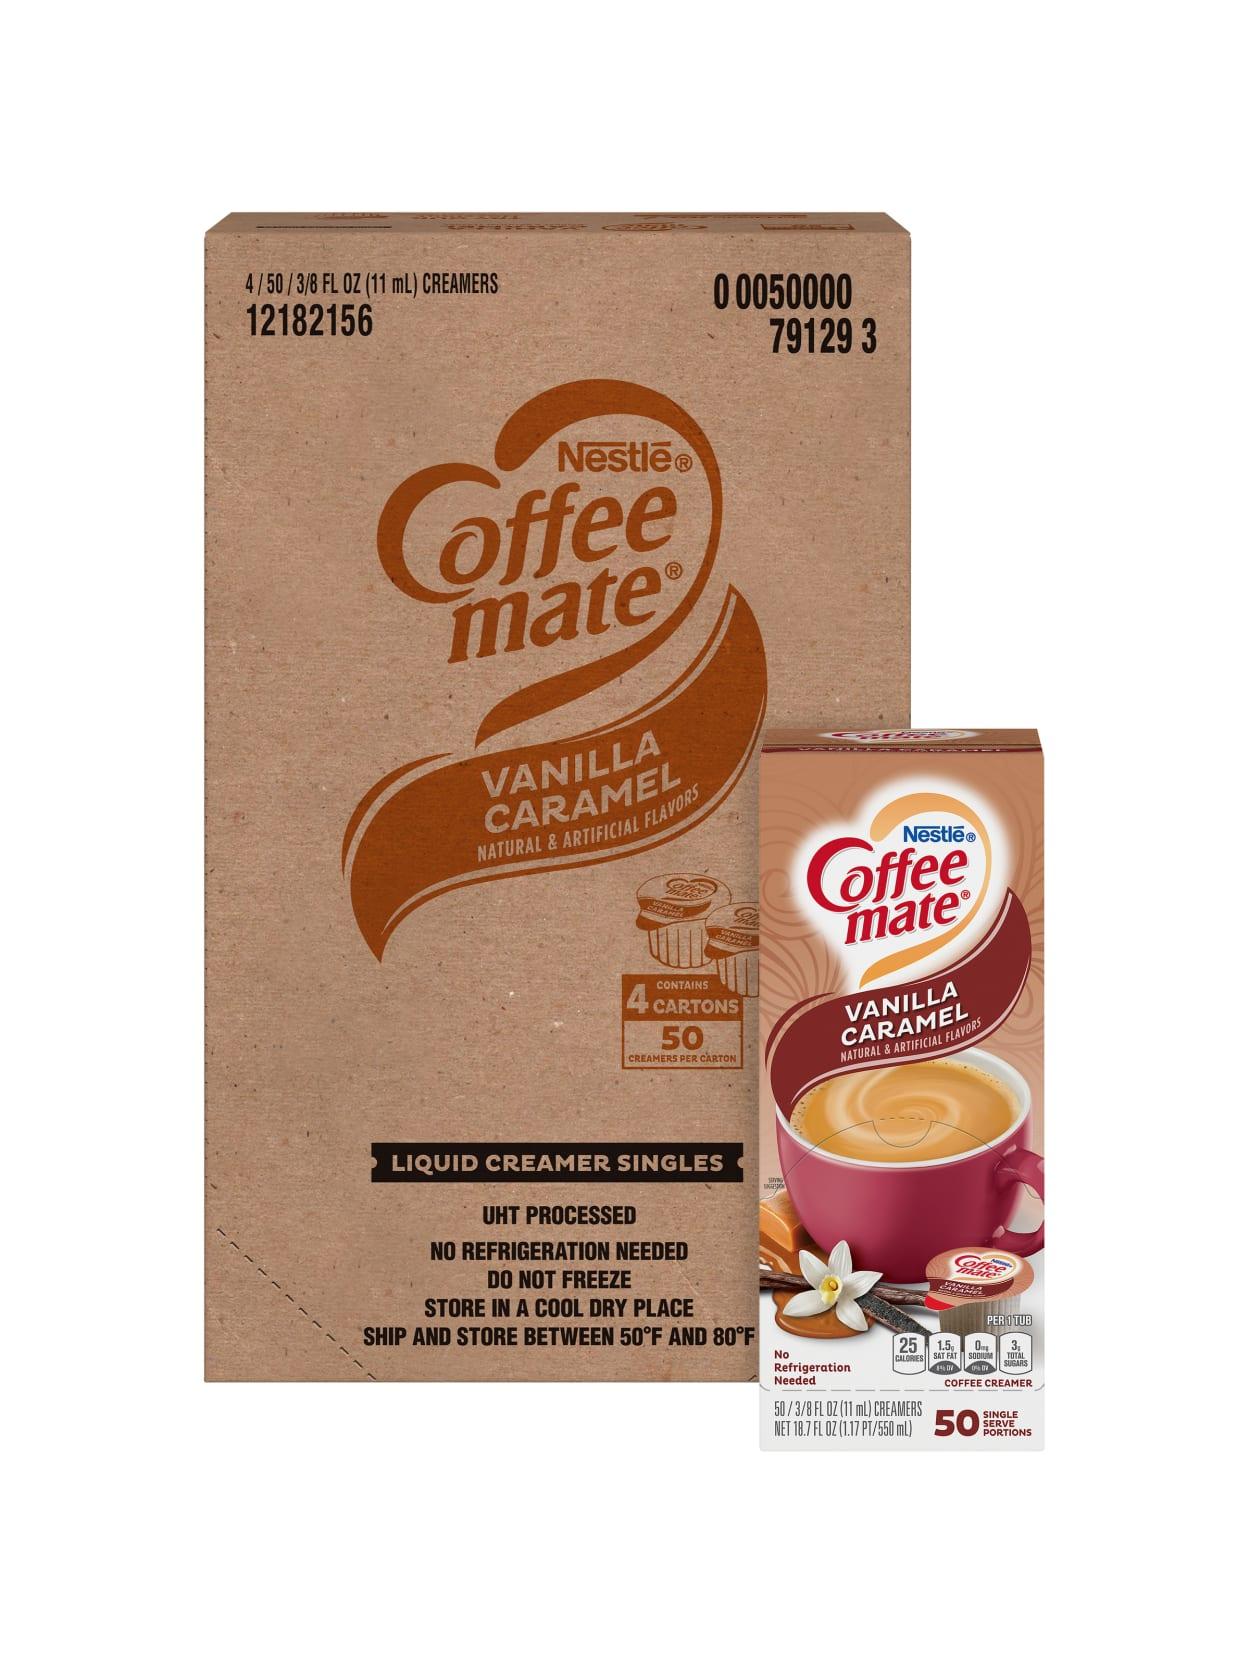 Coffee Mate Liquid Coffee Creamer Tub Singles Gluten Free Vanilla Caramel Flavor 0 38 Fl Oz 11 Ml 200carton 200 Serving Office Depot